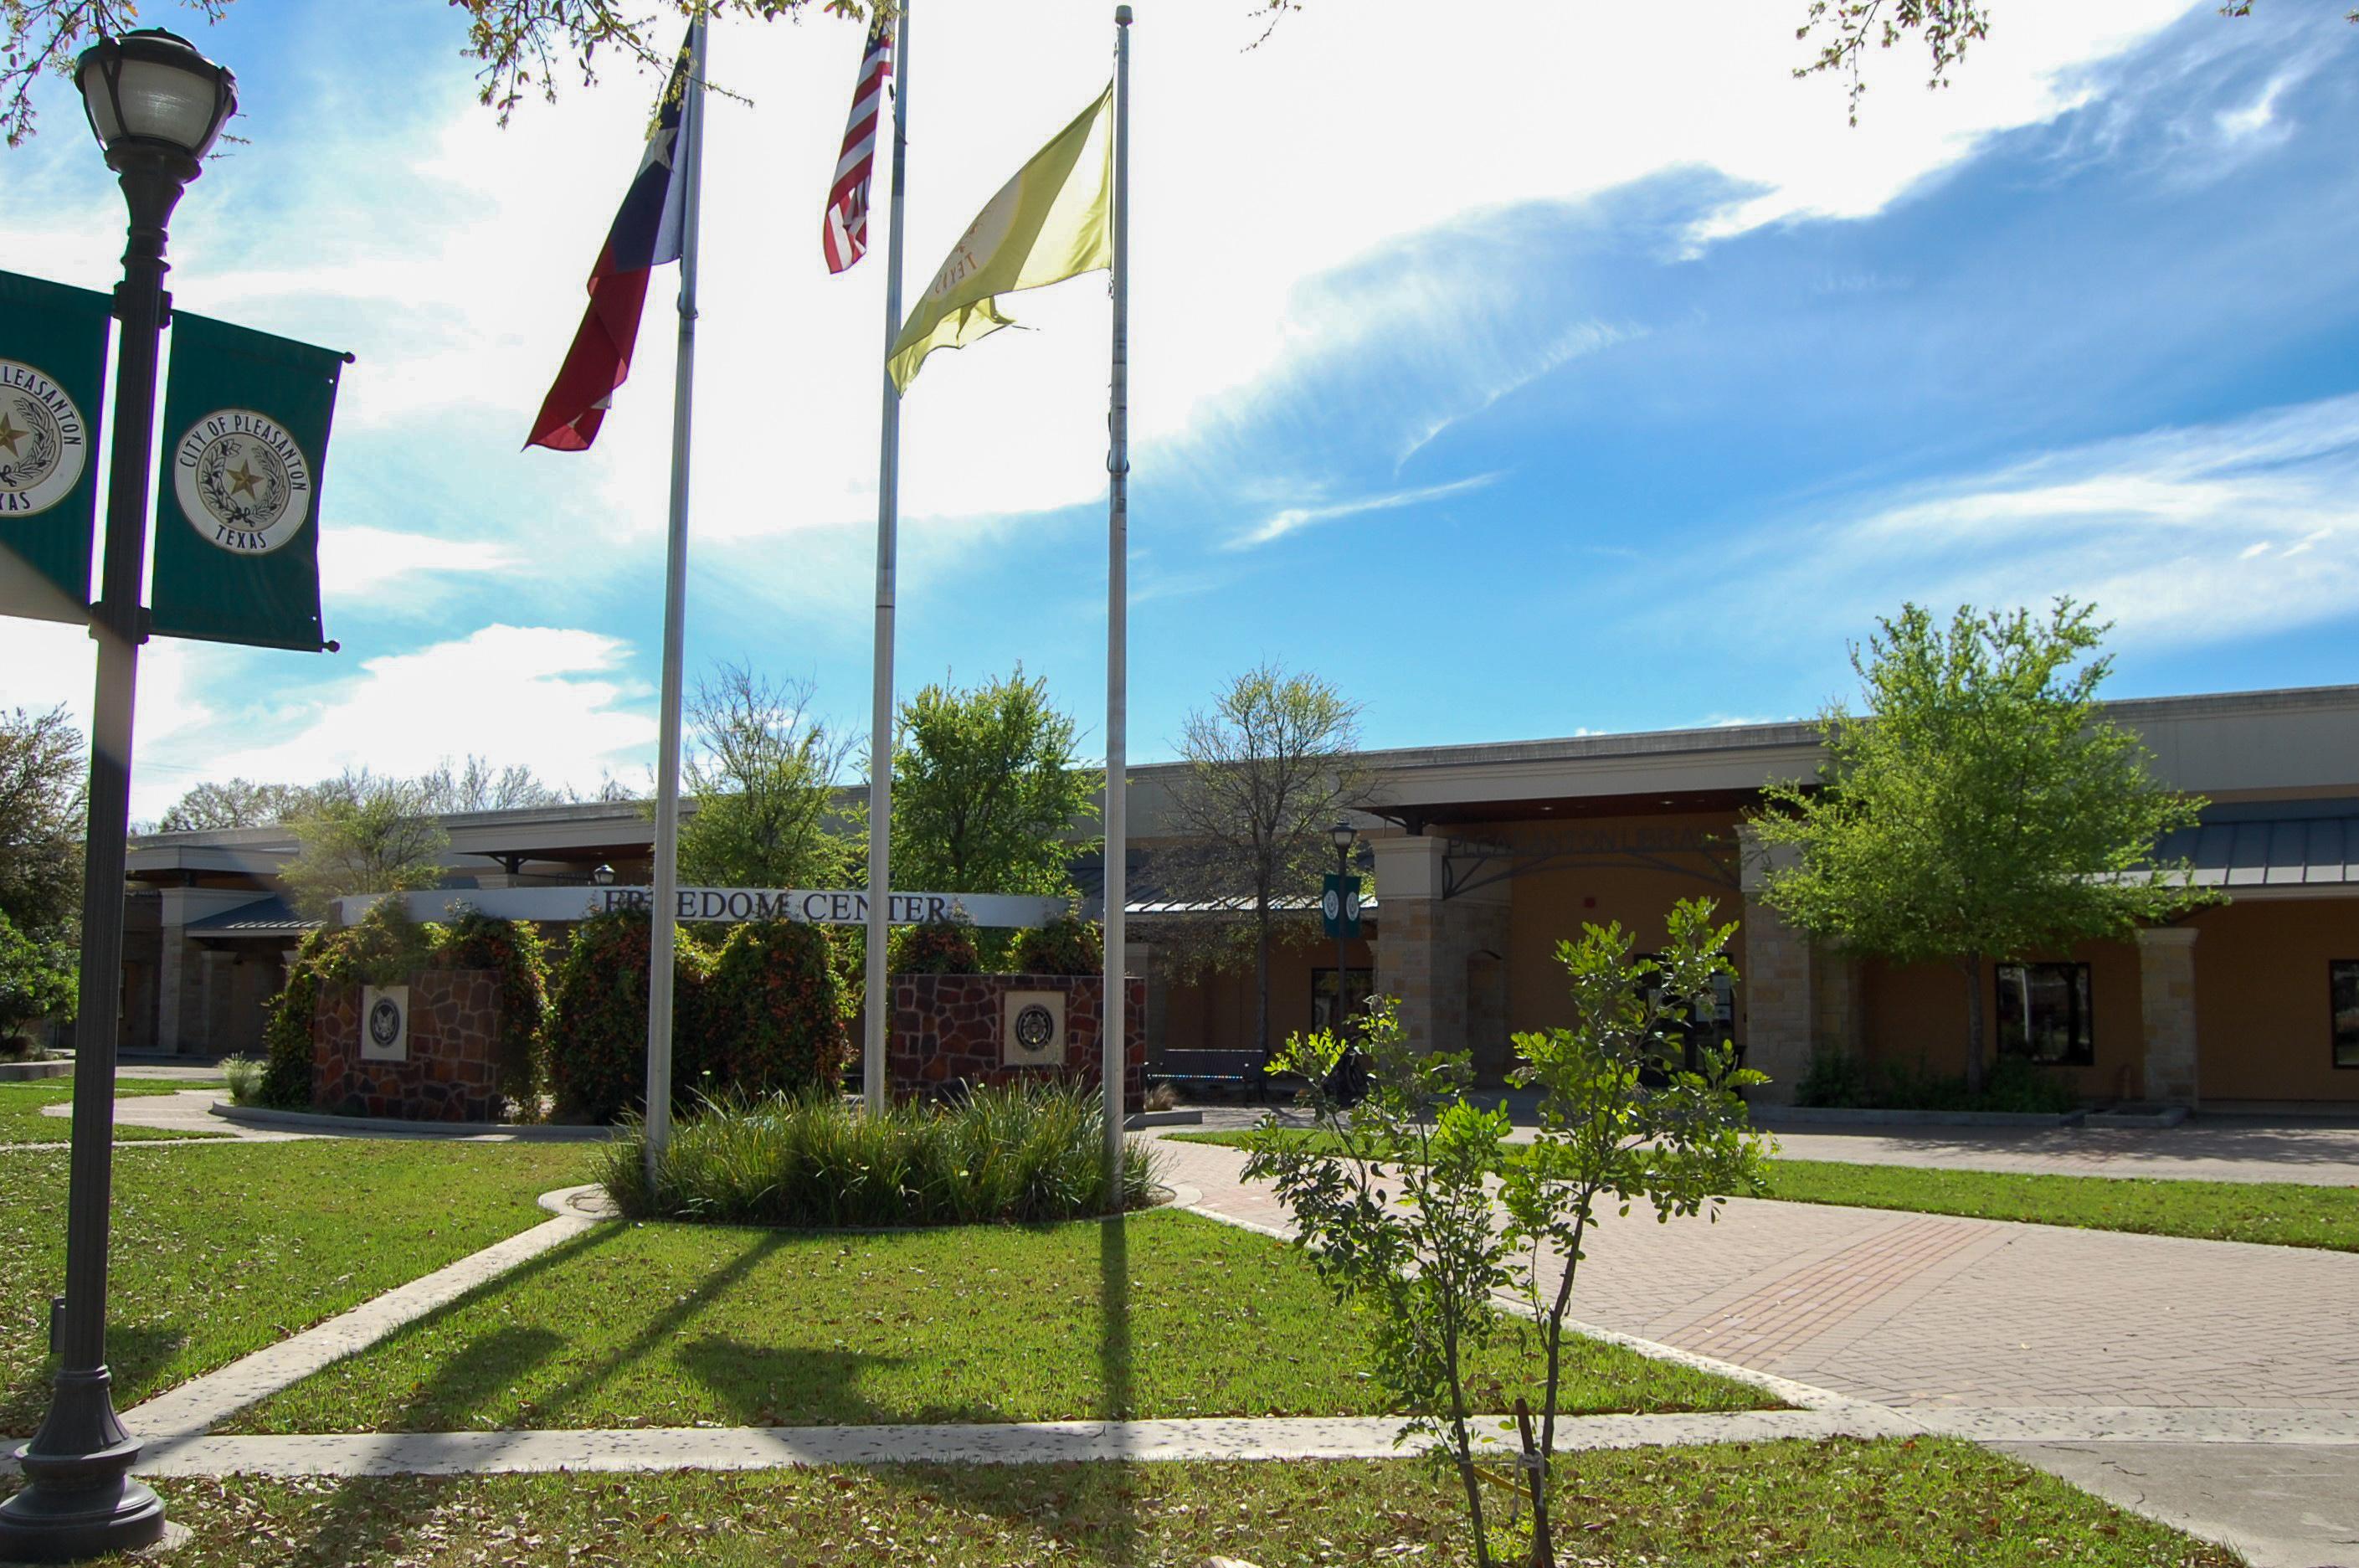 Pleasanton Library / Convention Center